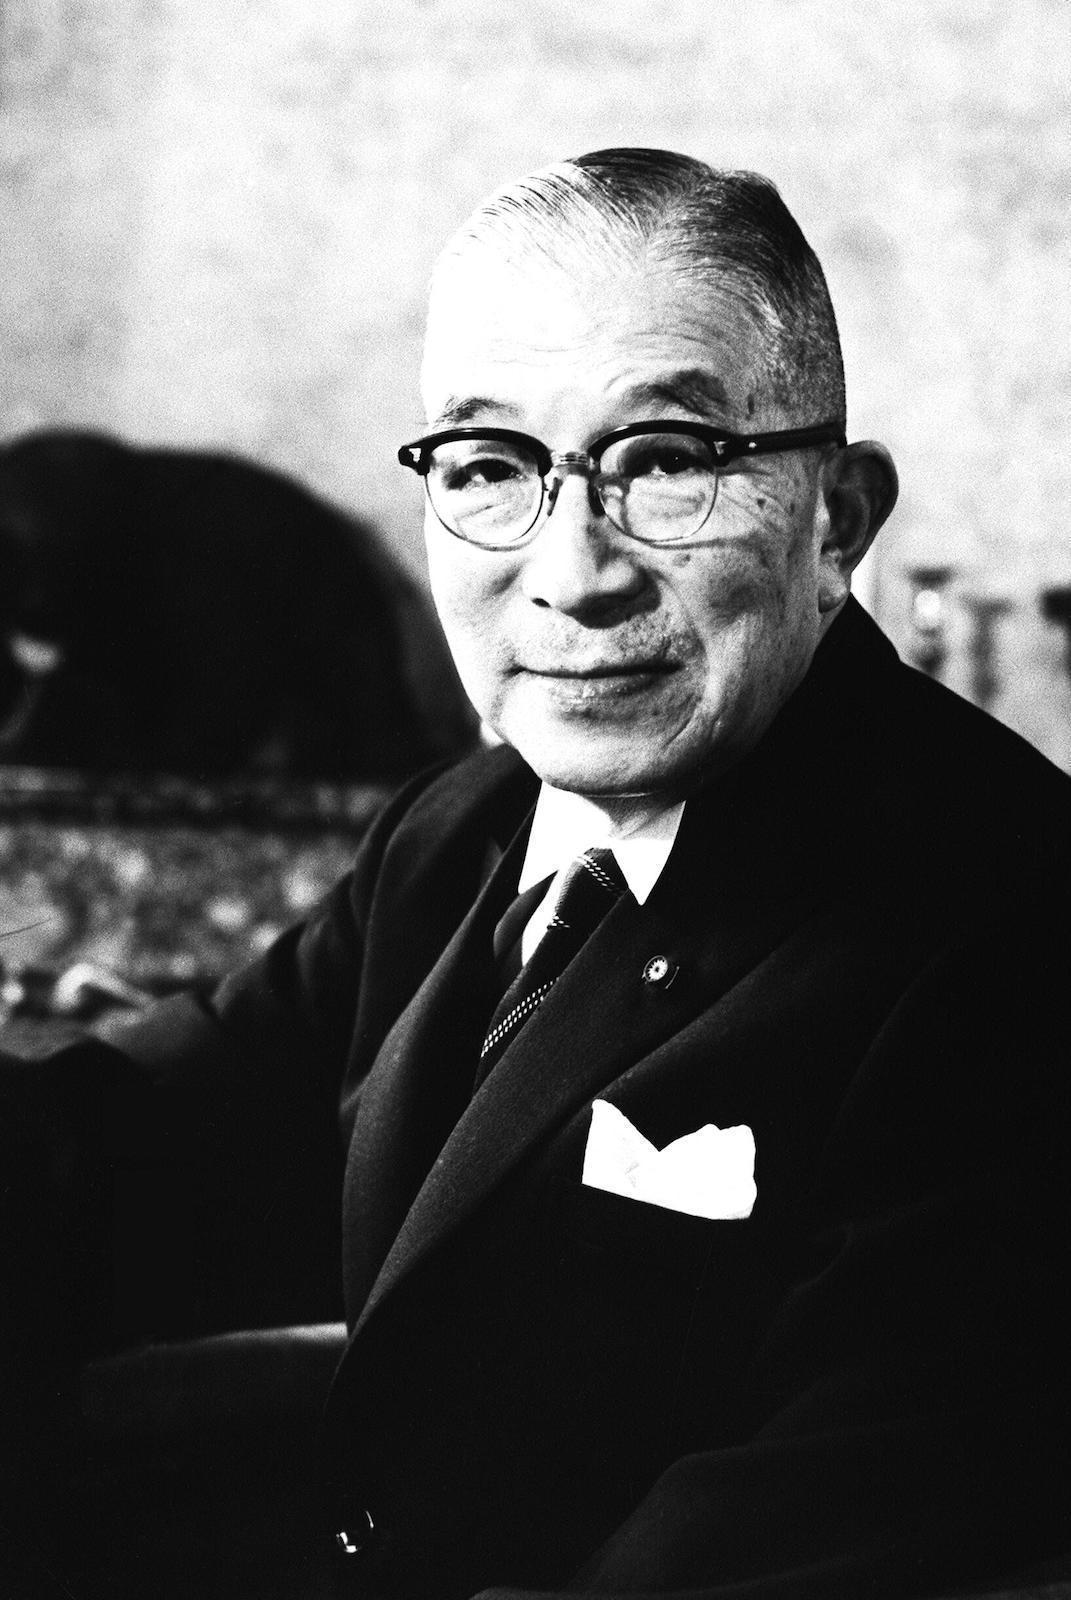 R・クーデンホーフ=カレルギー伯爵の影響を受け「友愛」を提唱したマスターメイソン鳩山一郎。鳩山はRCK伯爵の反全体主義の人道主義的著書『自由と人生』の翻訳者であり、本書の友愛精神の継承者である。